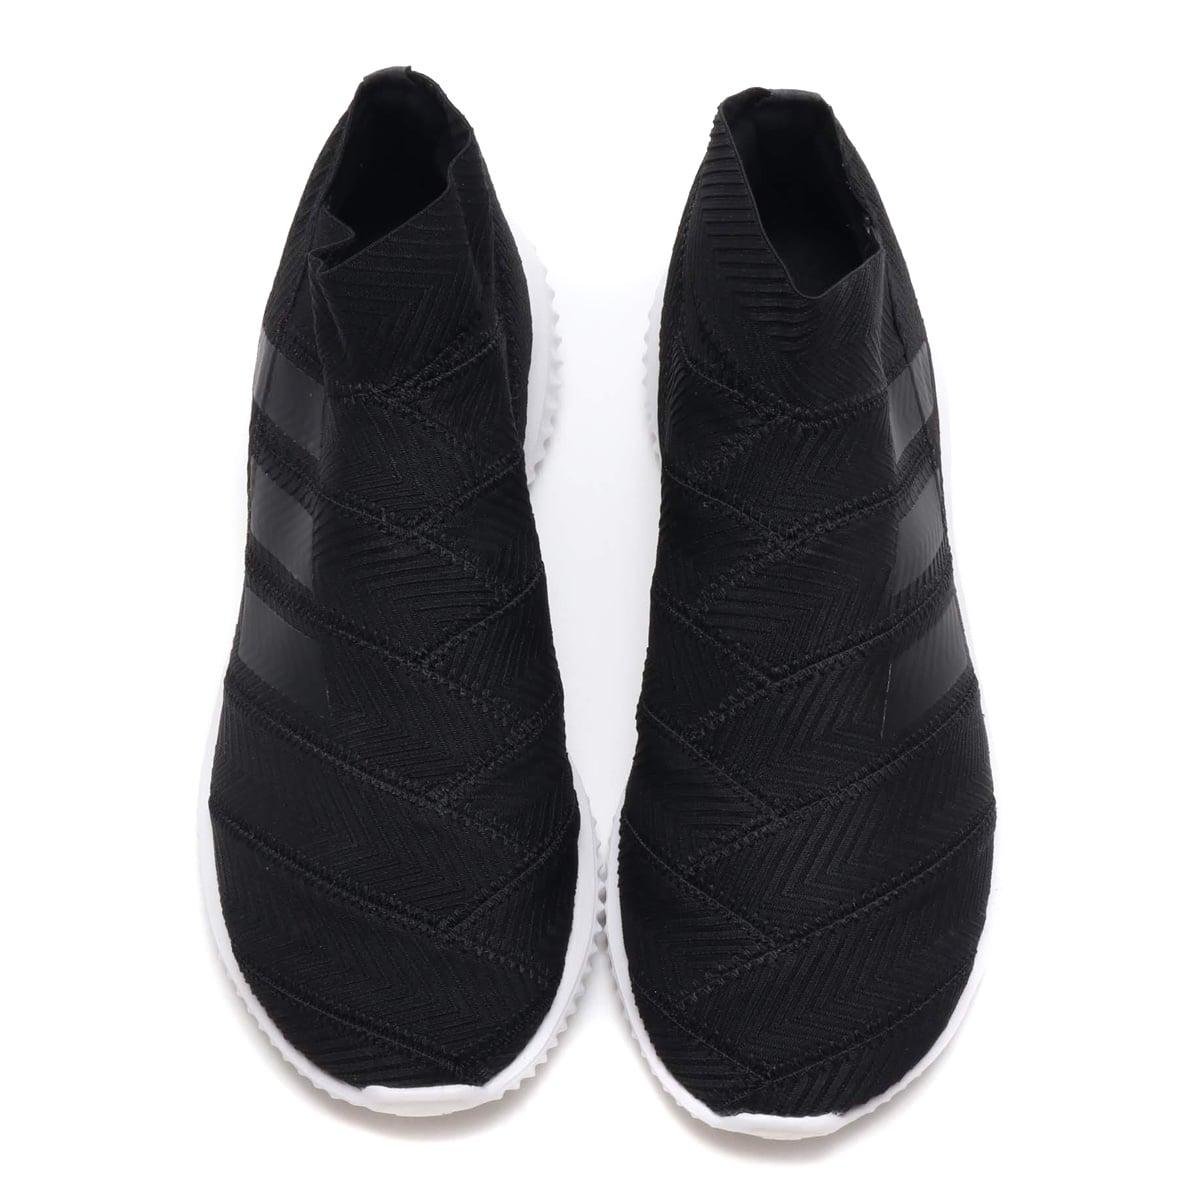 58ad45761 adidas NEMEZIZ TANGO 18.1 TR CORE BLACK/CORE BLACK/RUNNING  WHITE_photo_large. 【お取り寄せ商品】【adidas 2018FALL】